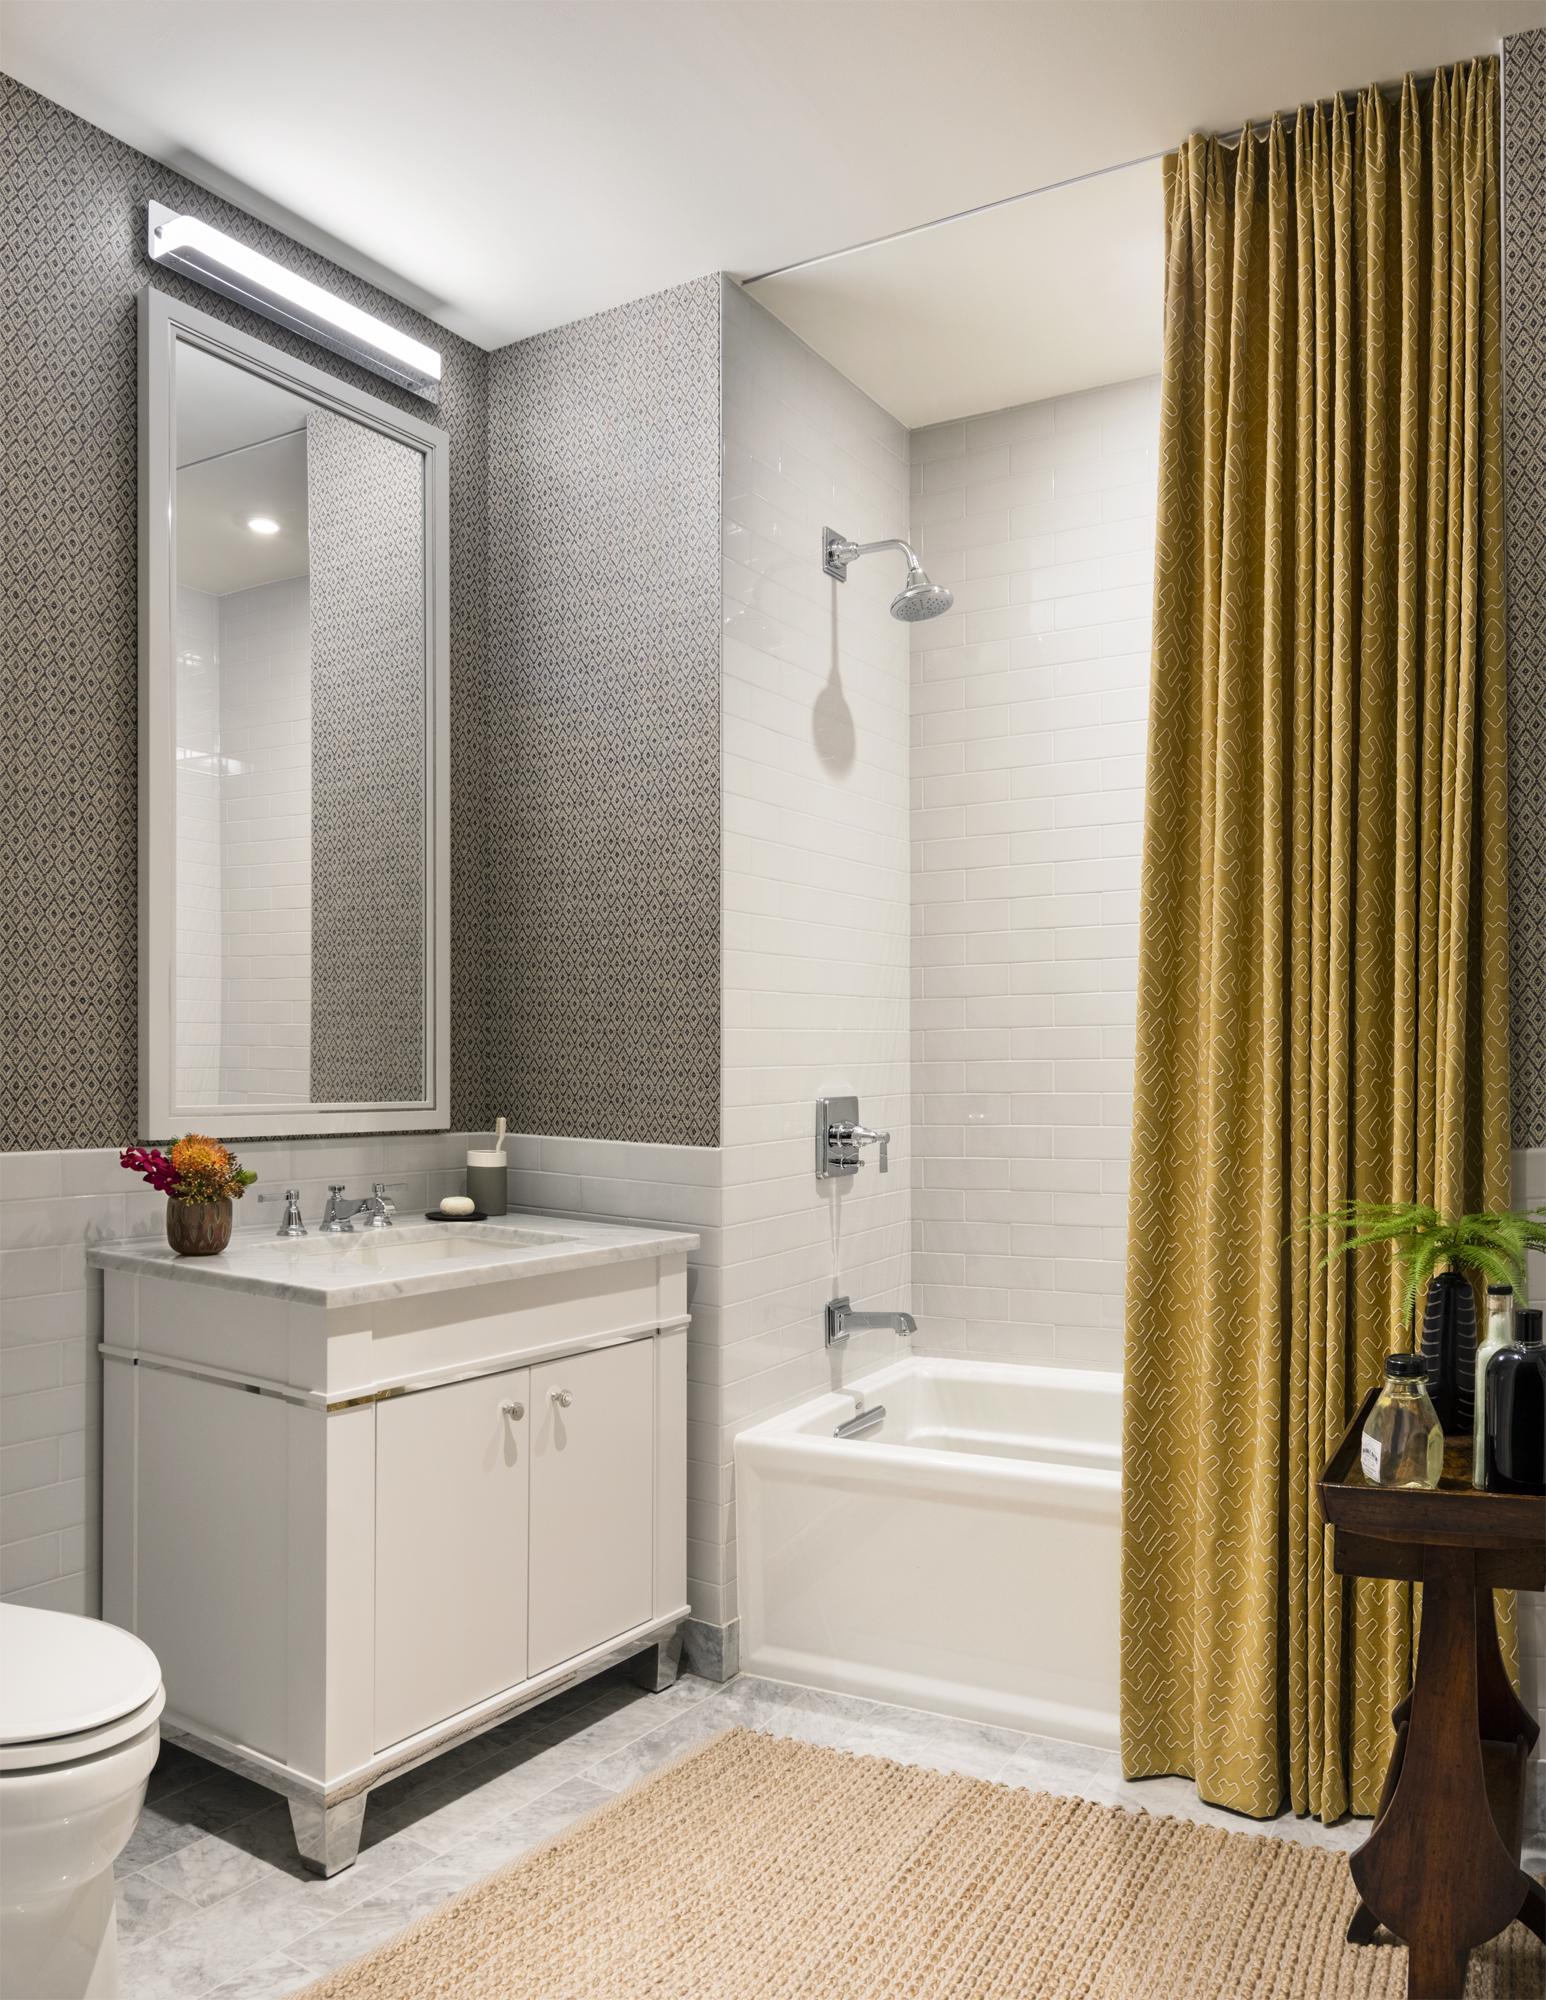 11_One-Bennett-Park-Condo-5106-Secondary-Bathroom.jpg